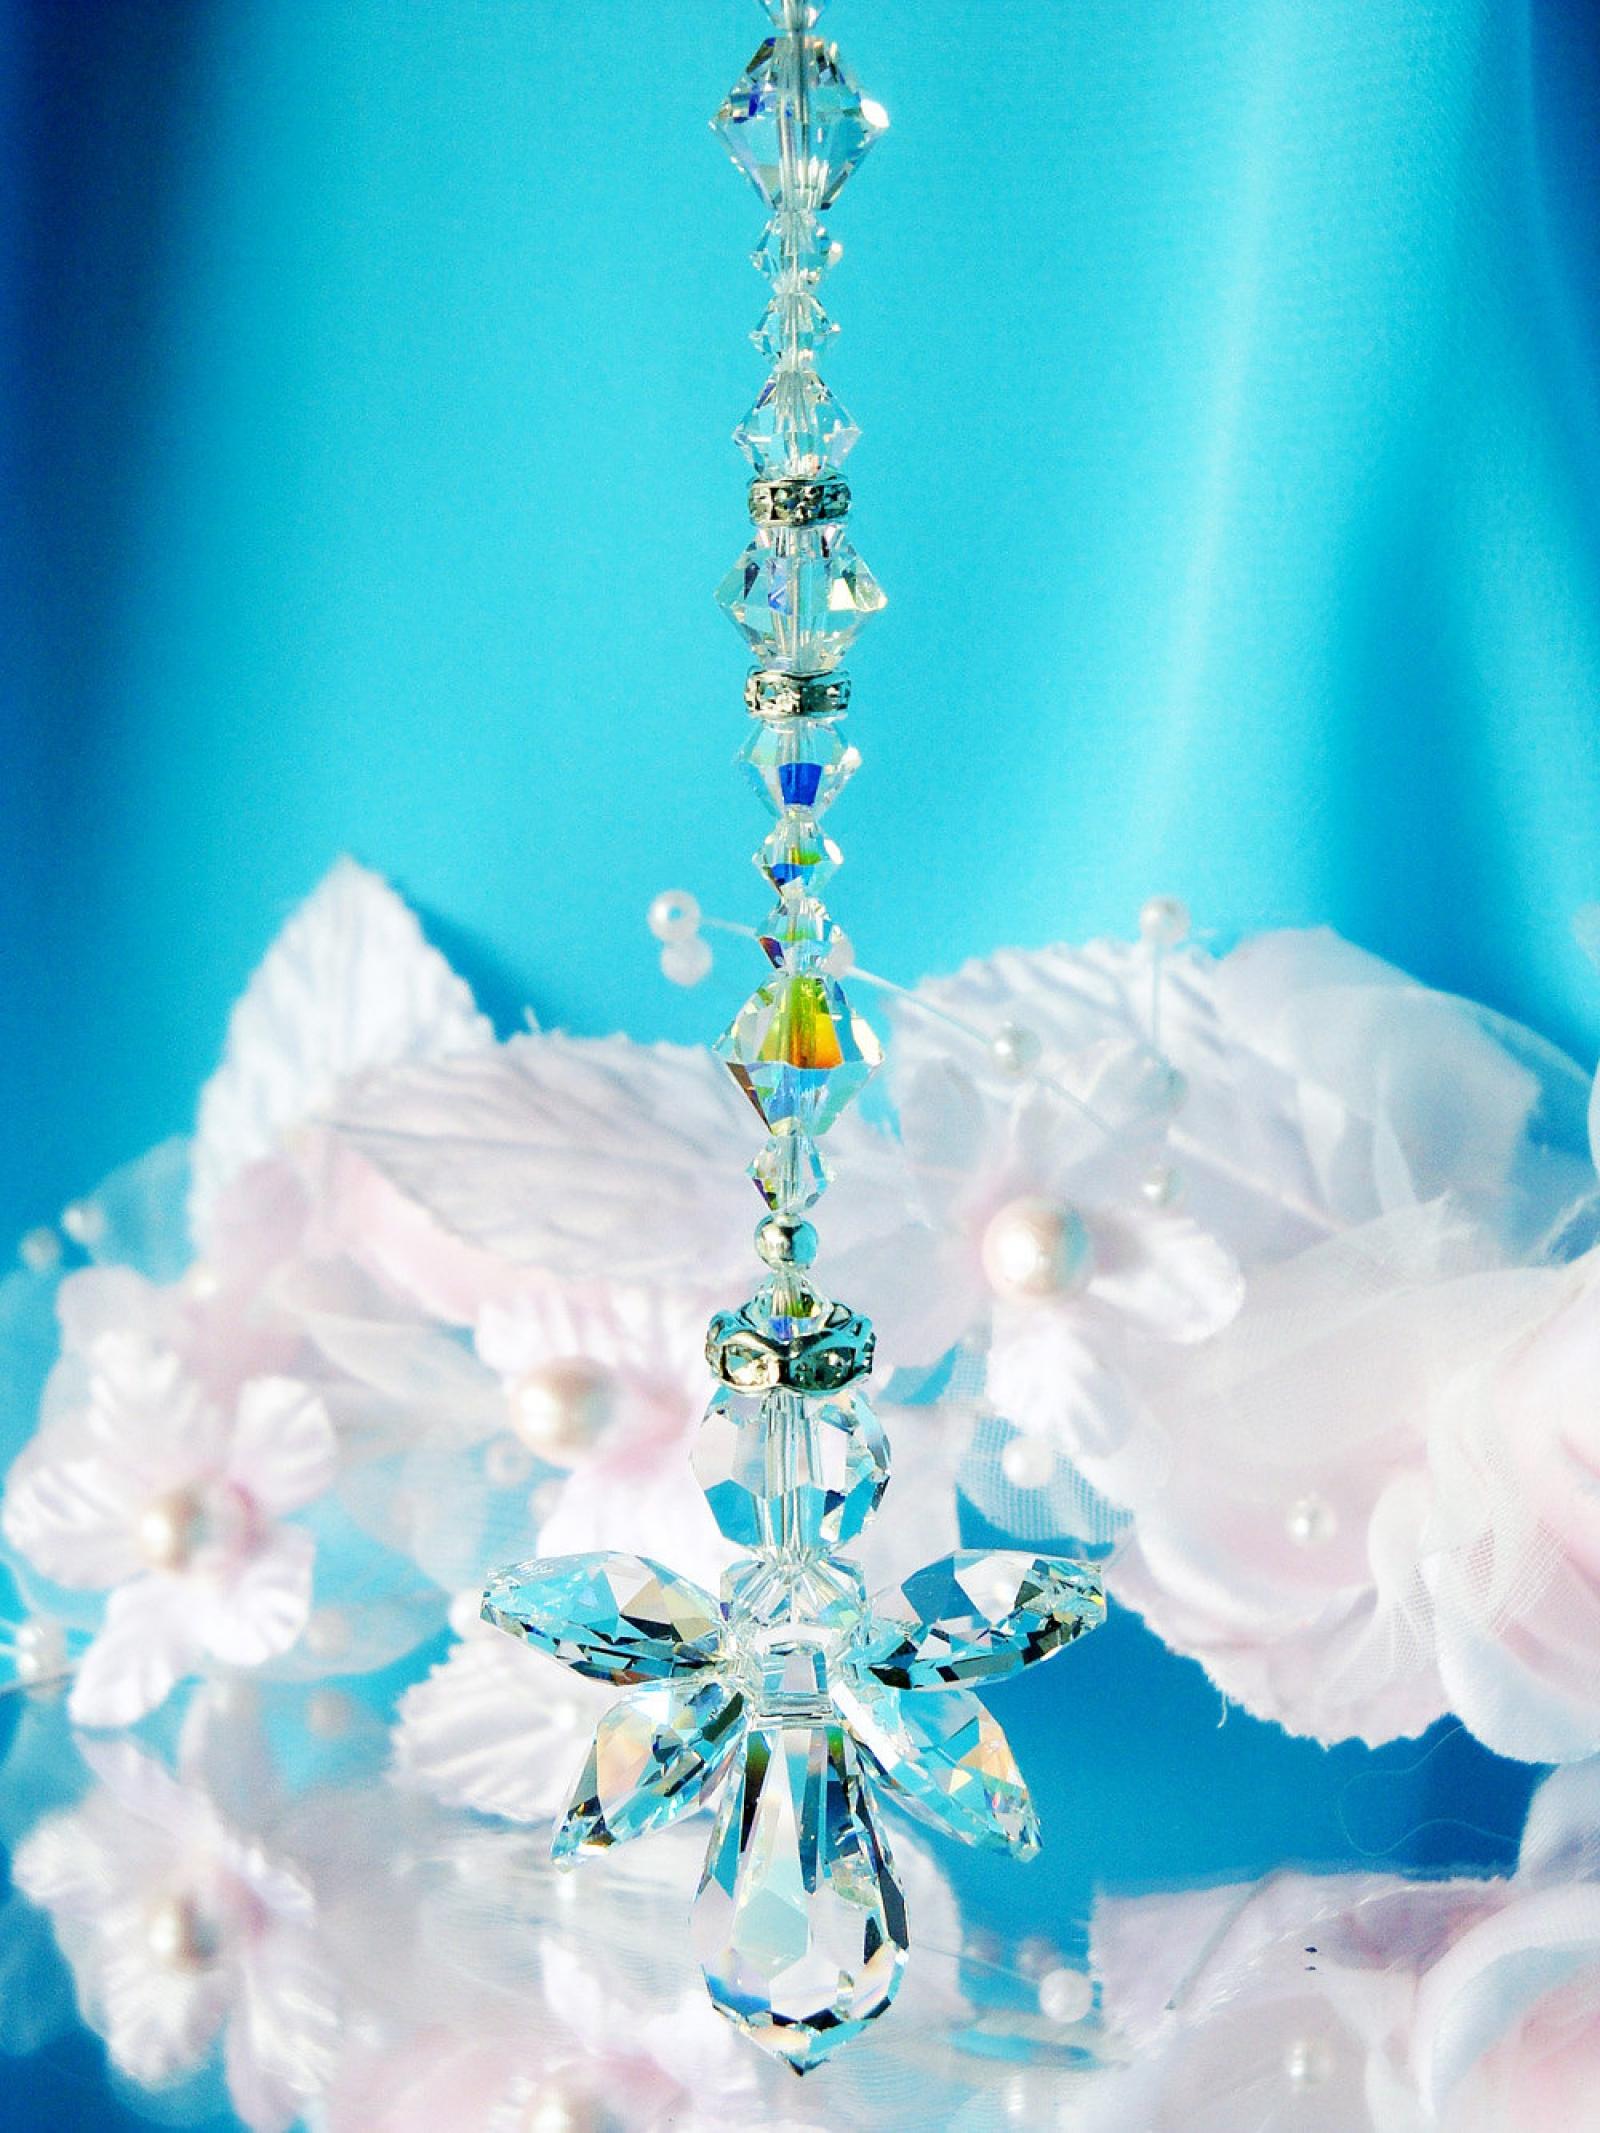 guardian angel rear view mirror charm car accessories